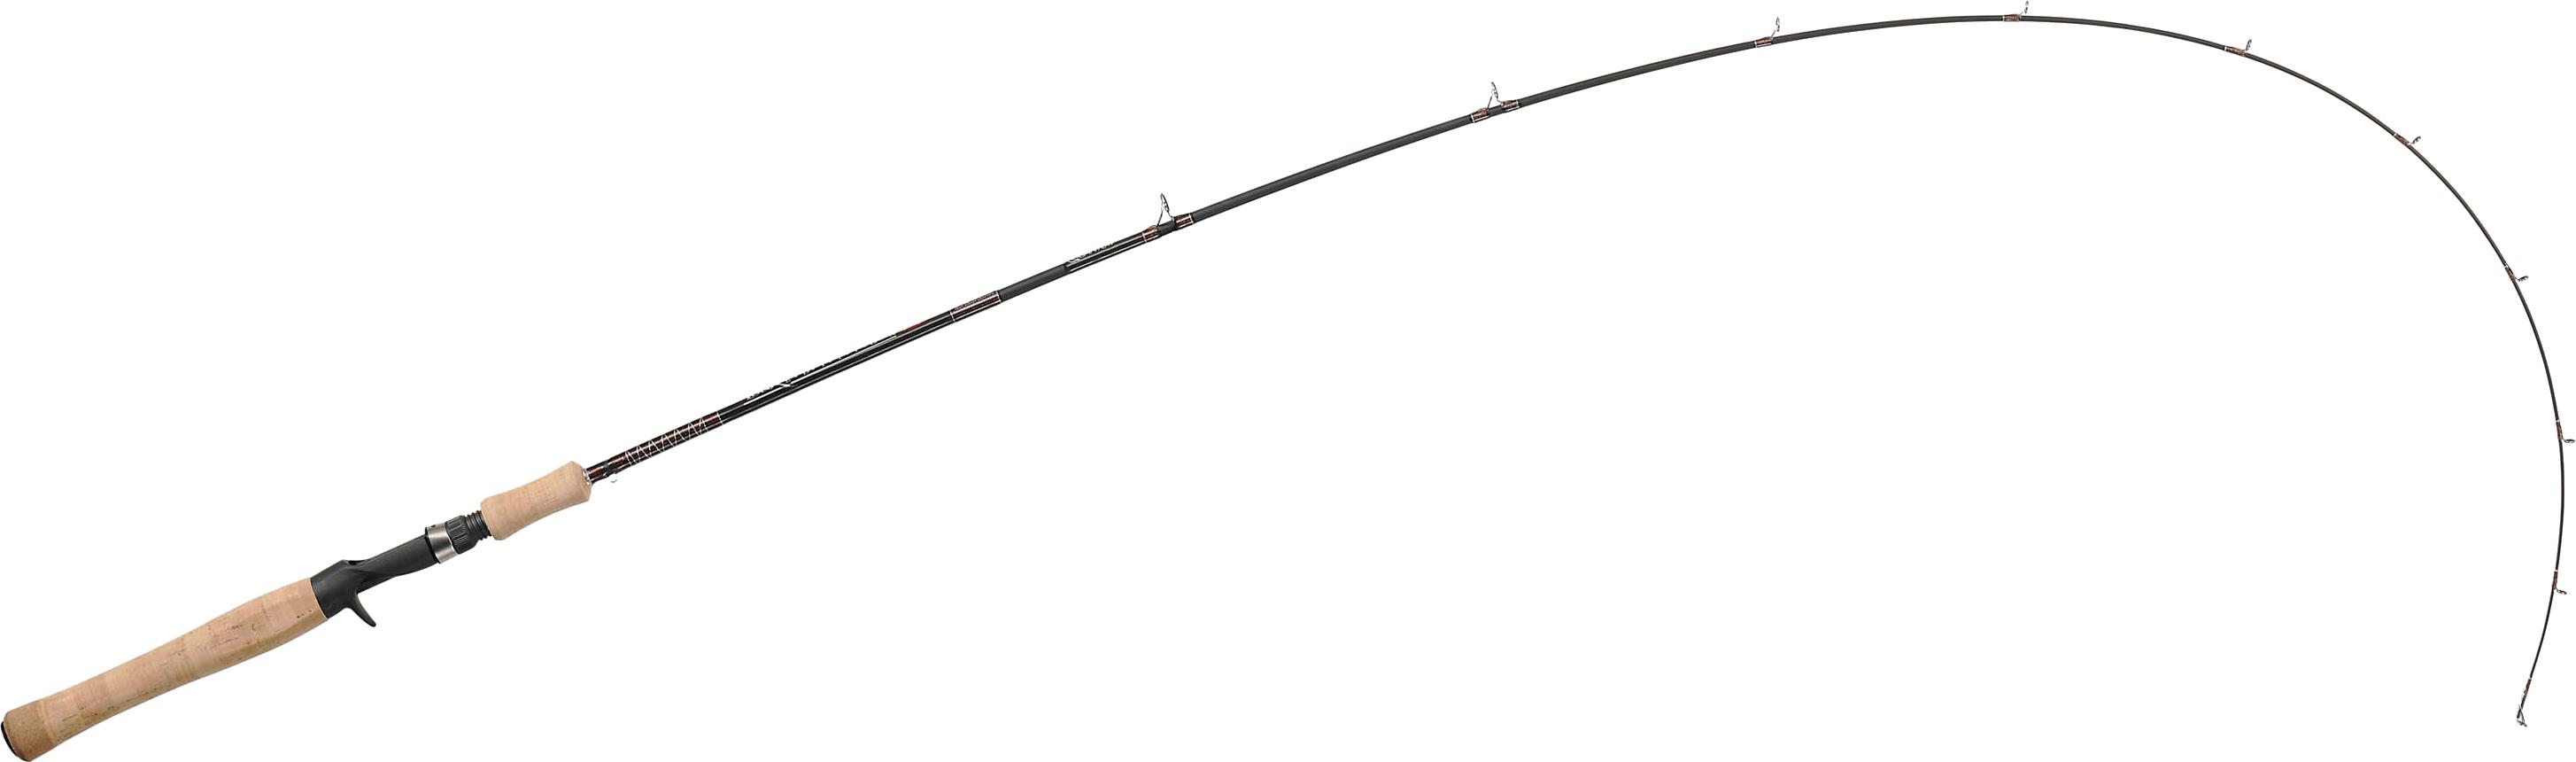 Fishing Pole PNG Transparent Images.